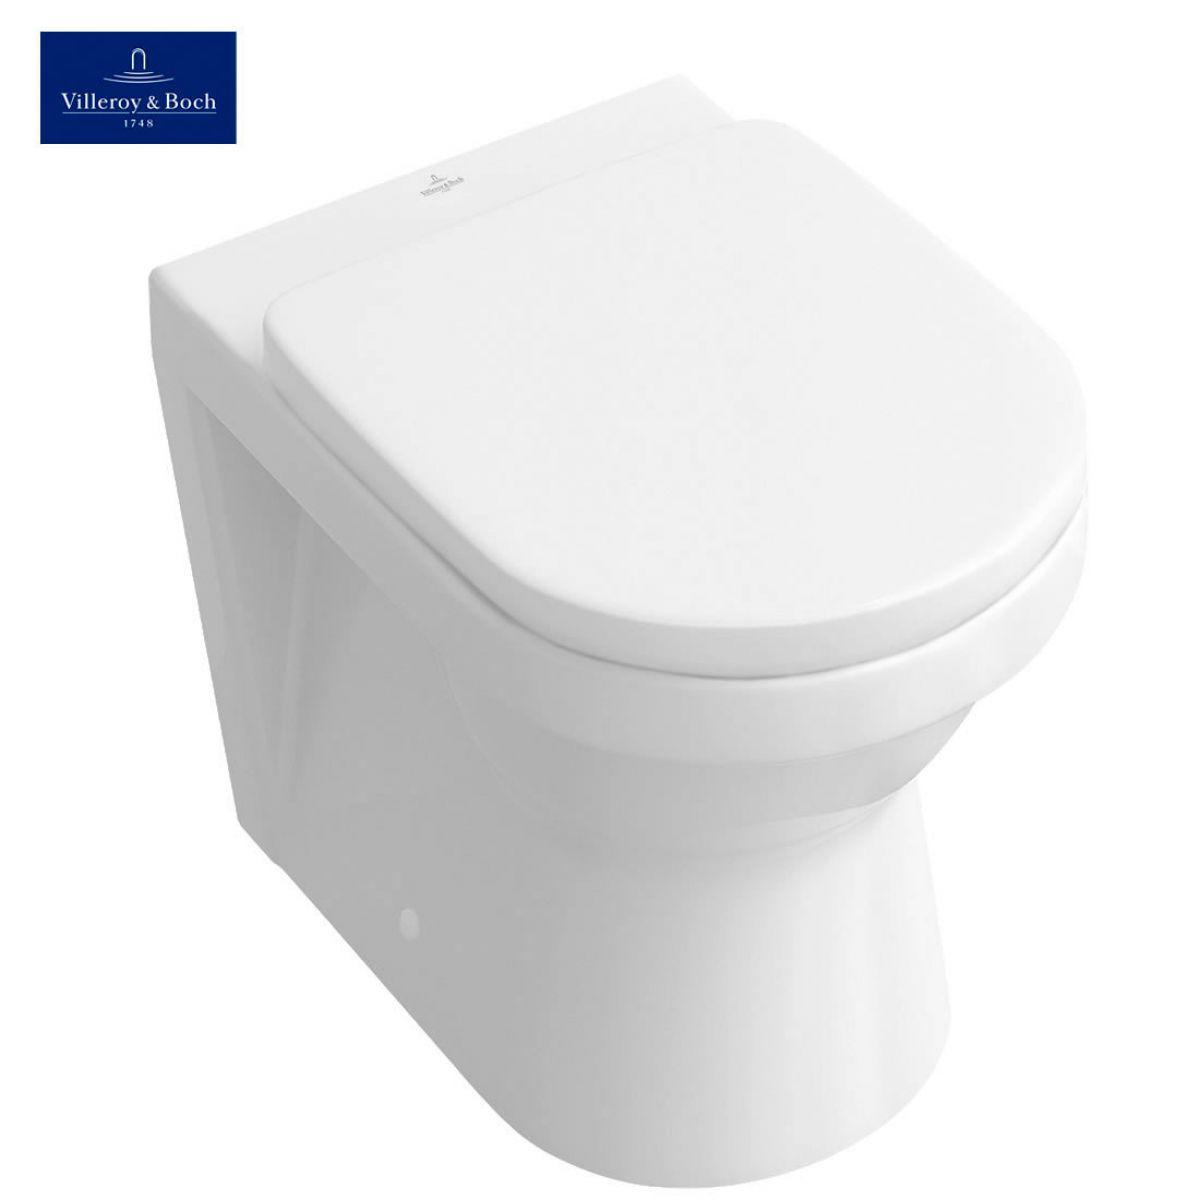 villeroy boch architectura back to wall toilet uk. Black Bedroom Furniture Sets. Home Design Ideas